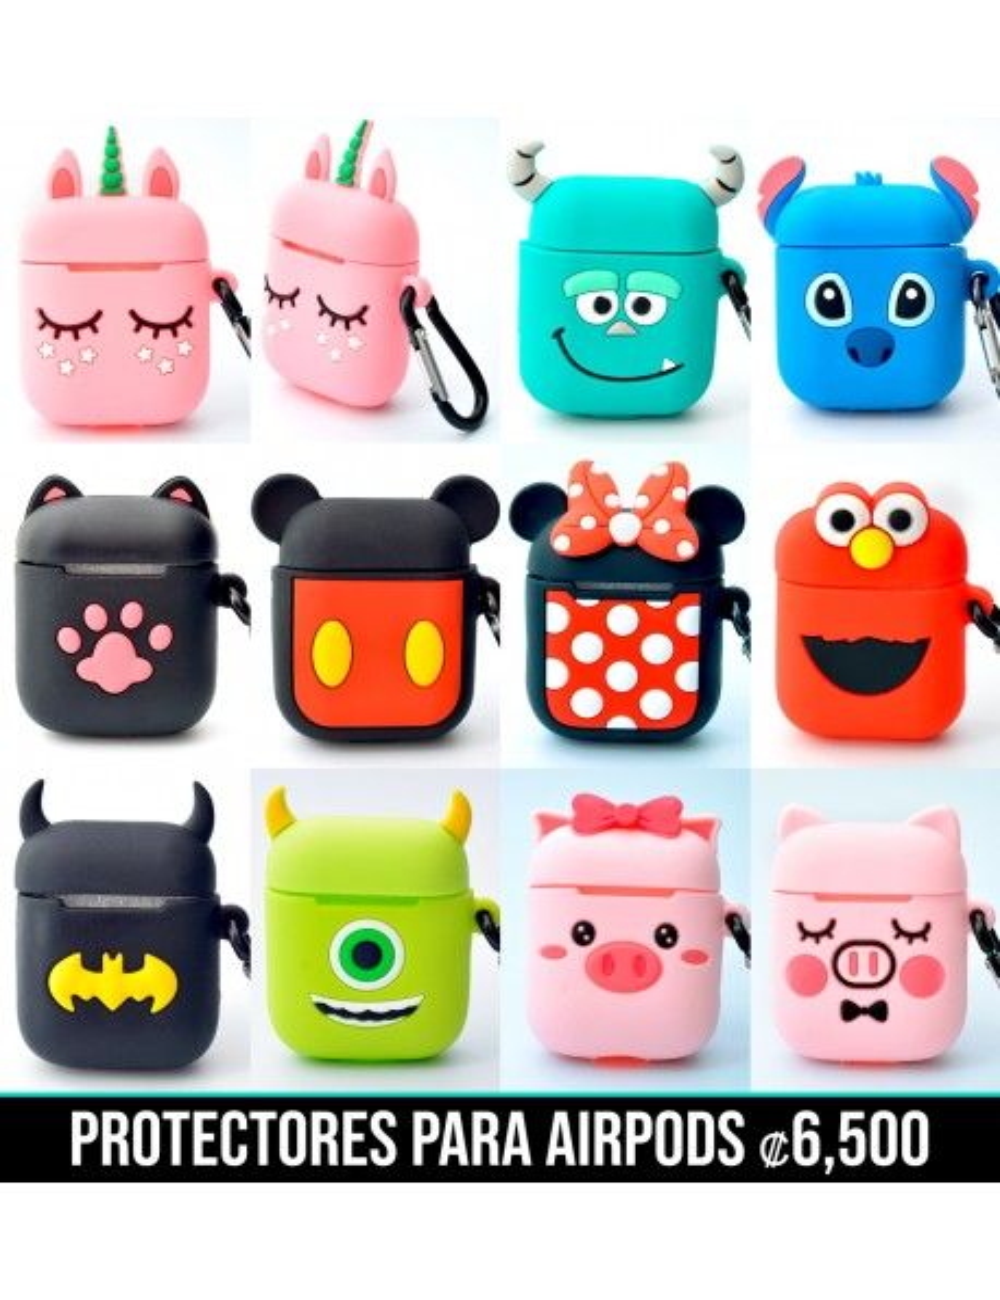 Protectores para AirPods